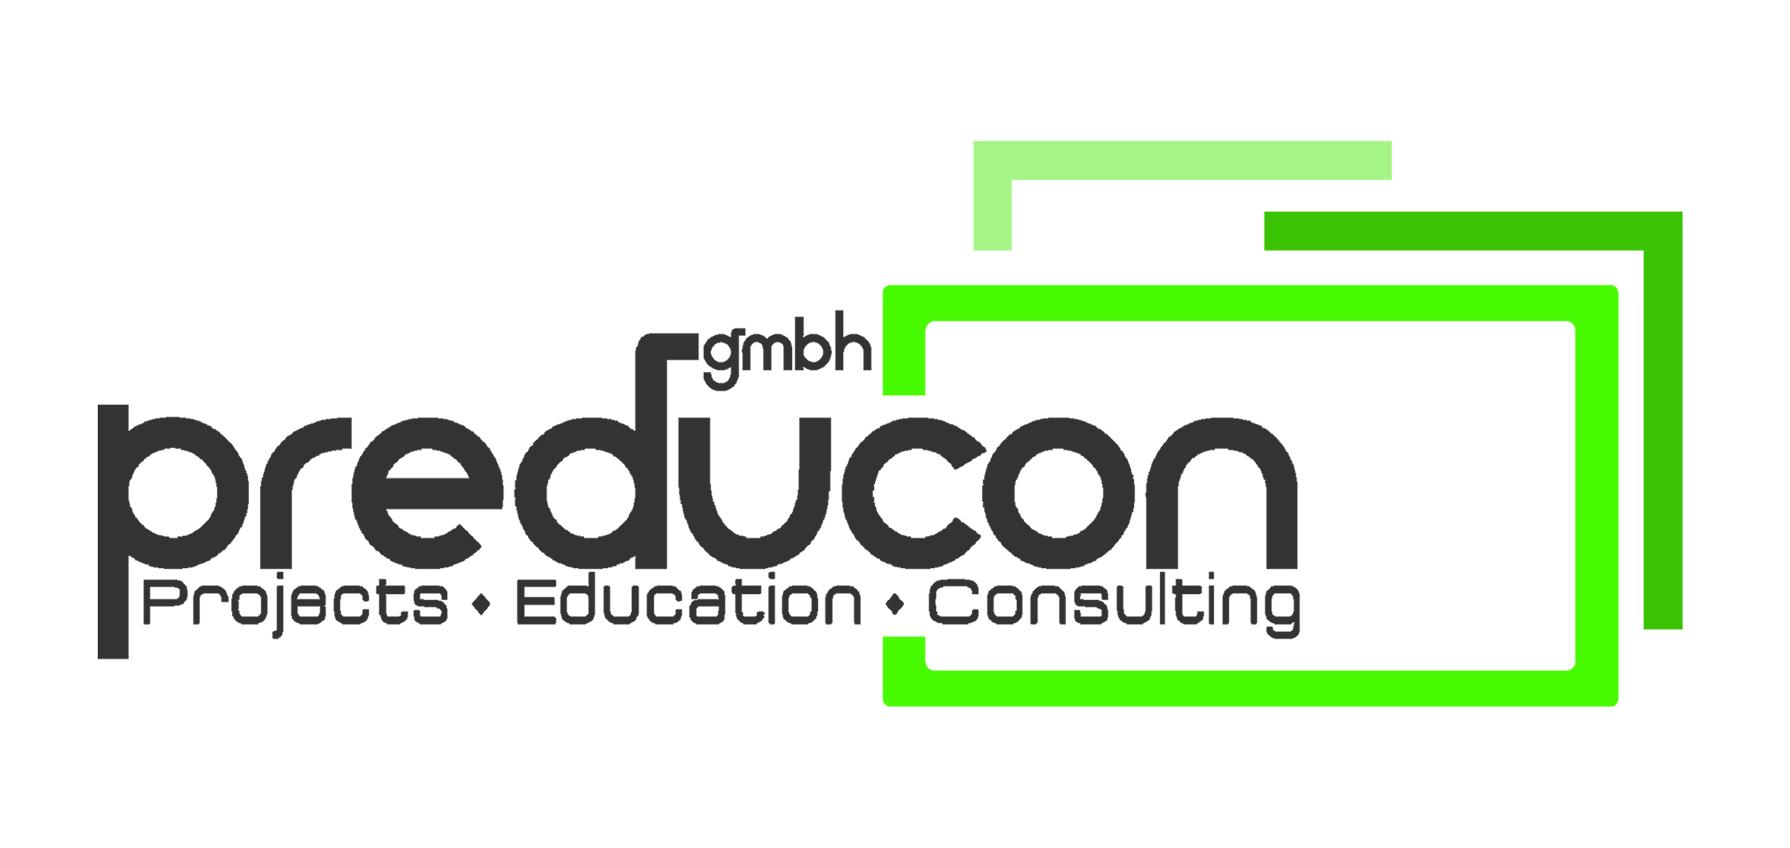 preducon gmbh partner inserto network of experts